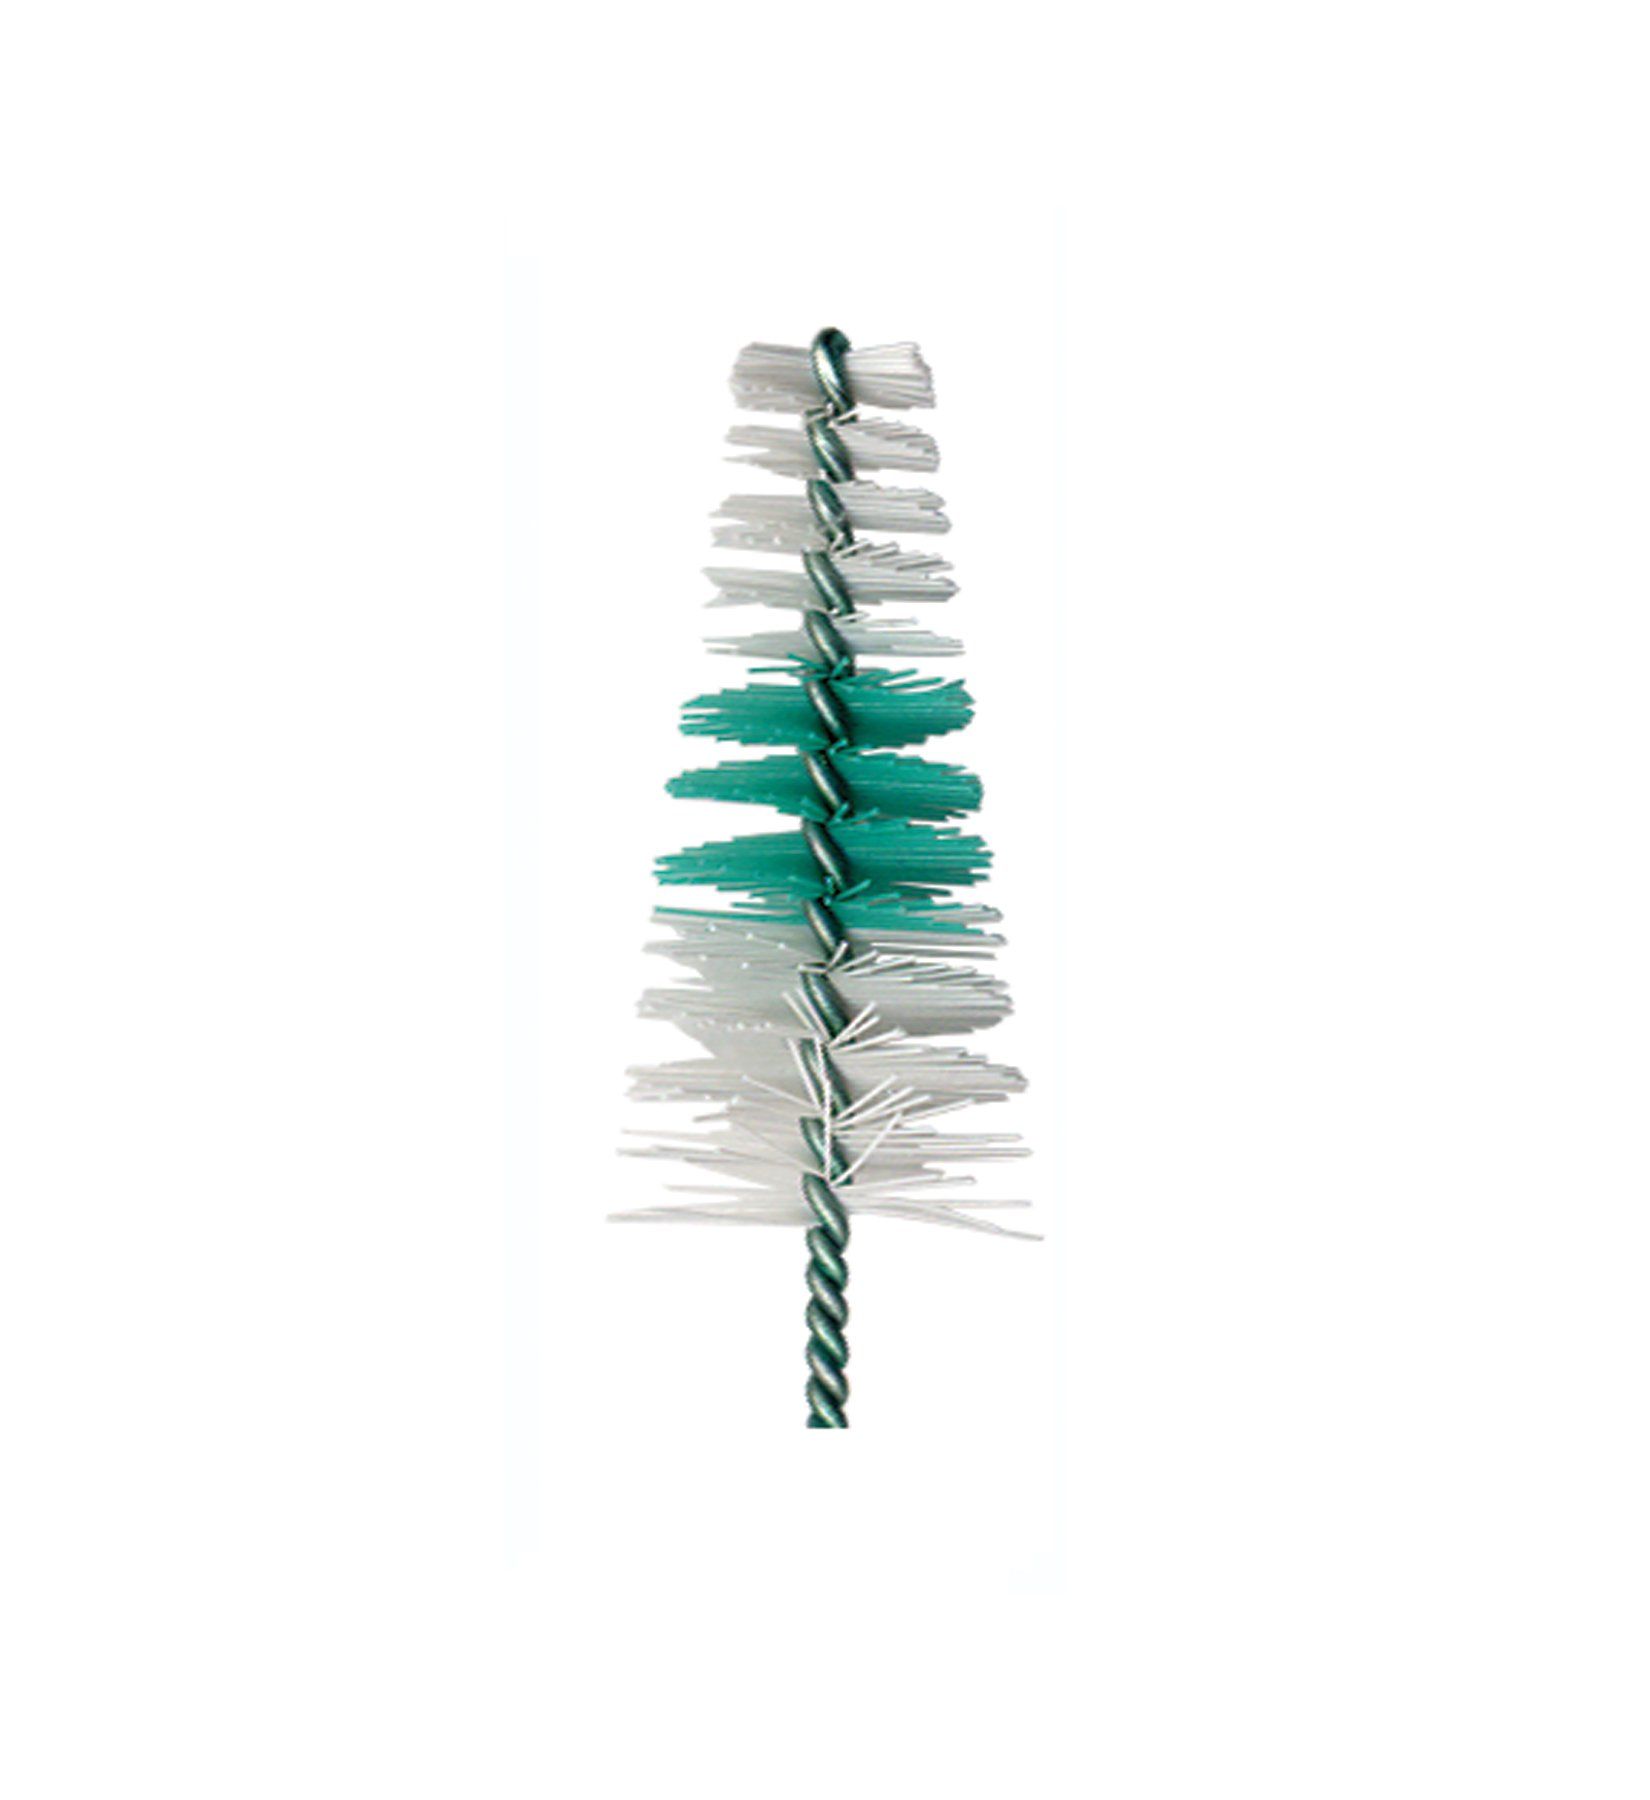 Staino Interdental Brush Refills, Jumbos/Large/Tapered (36 2-Brush Units | Total 72 Brushes)